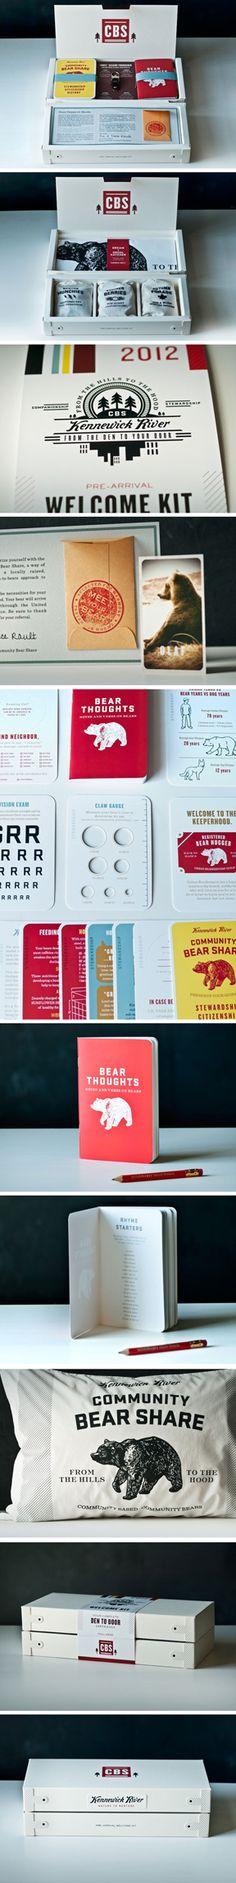 Community Bear Share Welcome Kit by Ultra Creative, Inc.